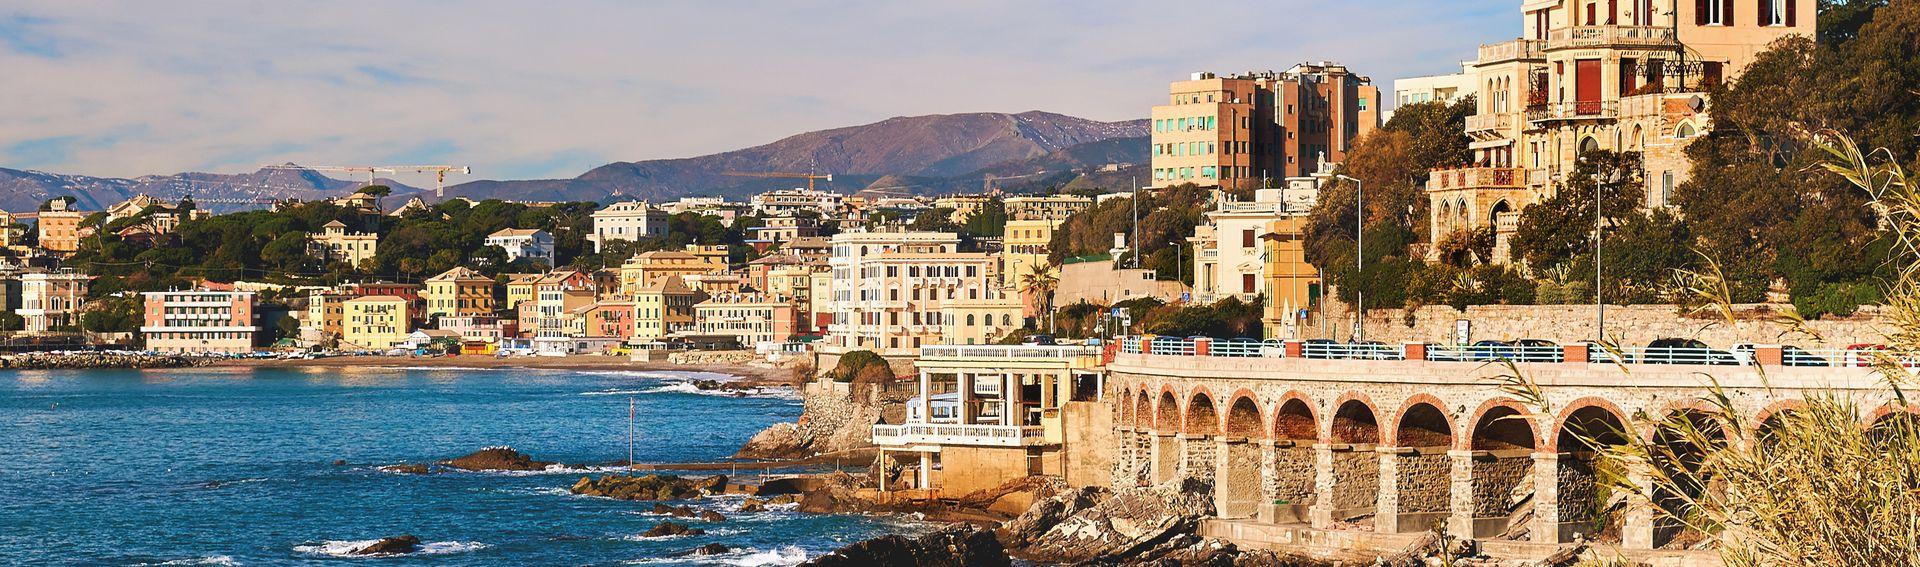 Province de Gênes